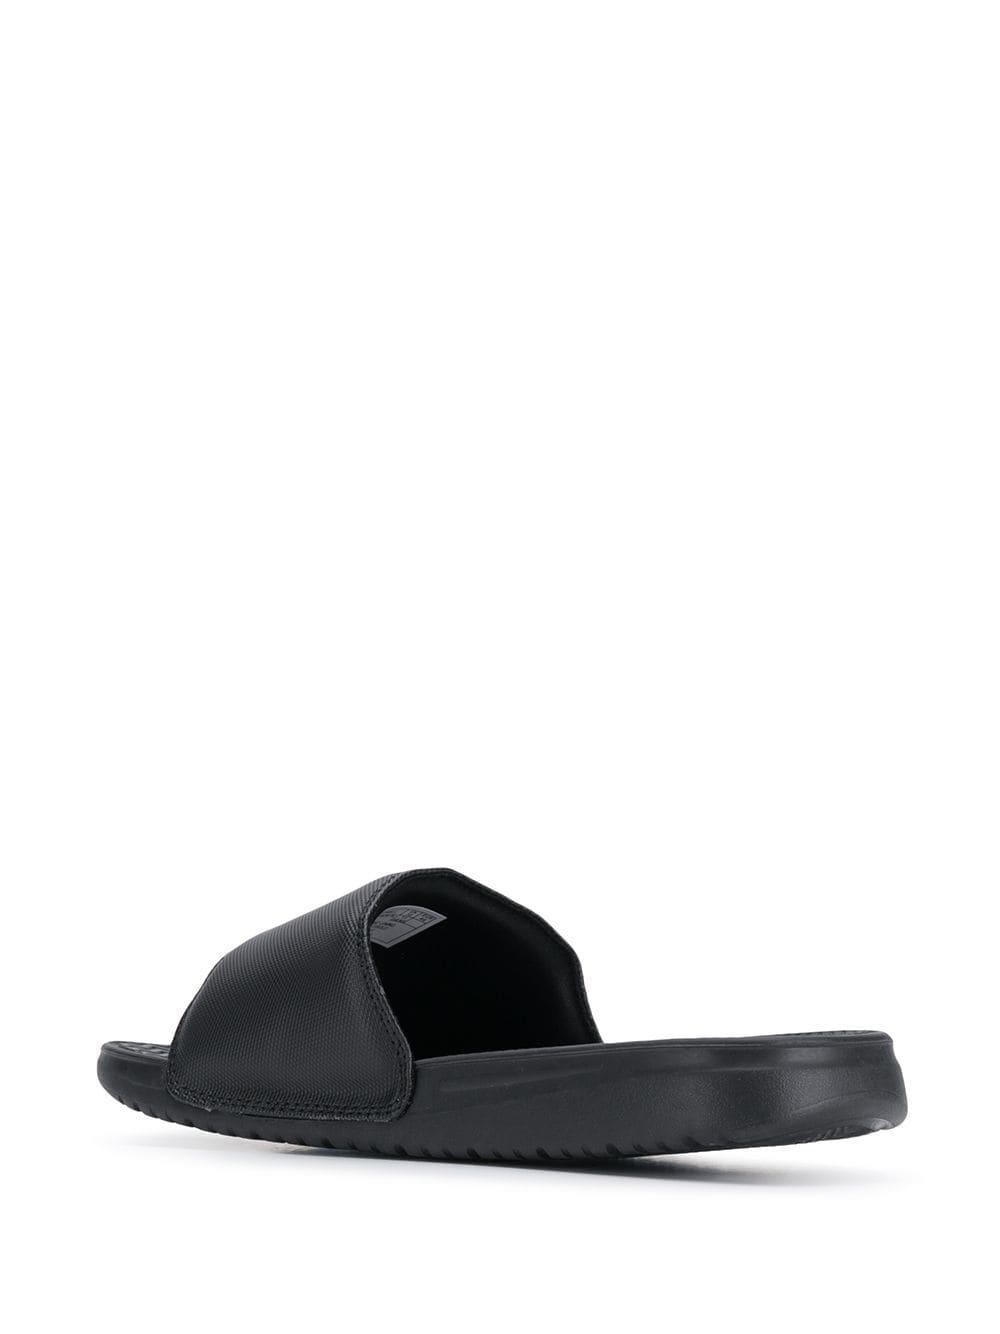 5573563c3028 Lyst - Polo Ralph Lauren Logo Patch Slides in Black for Men